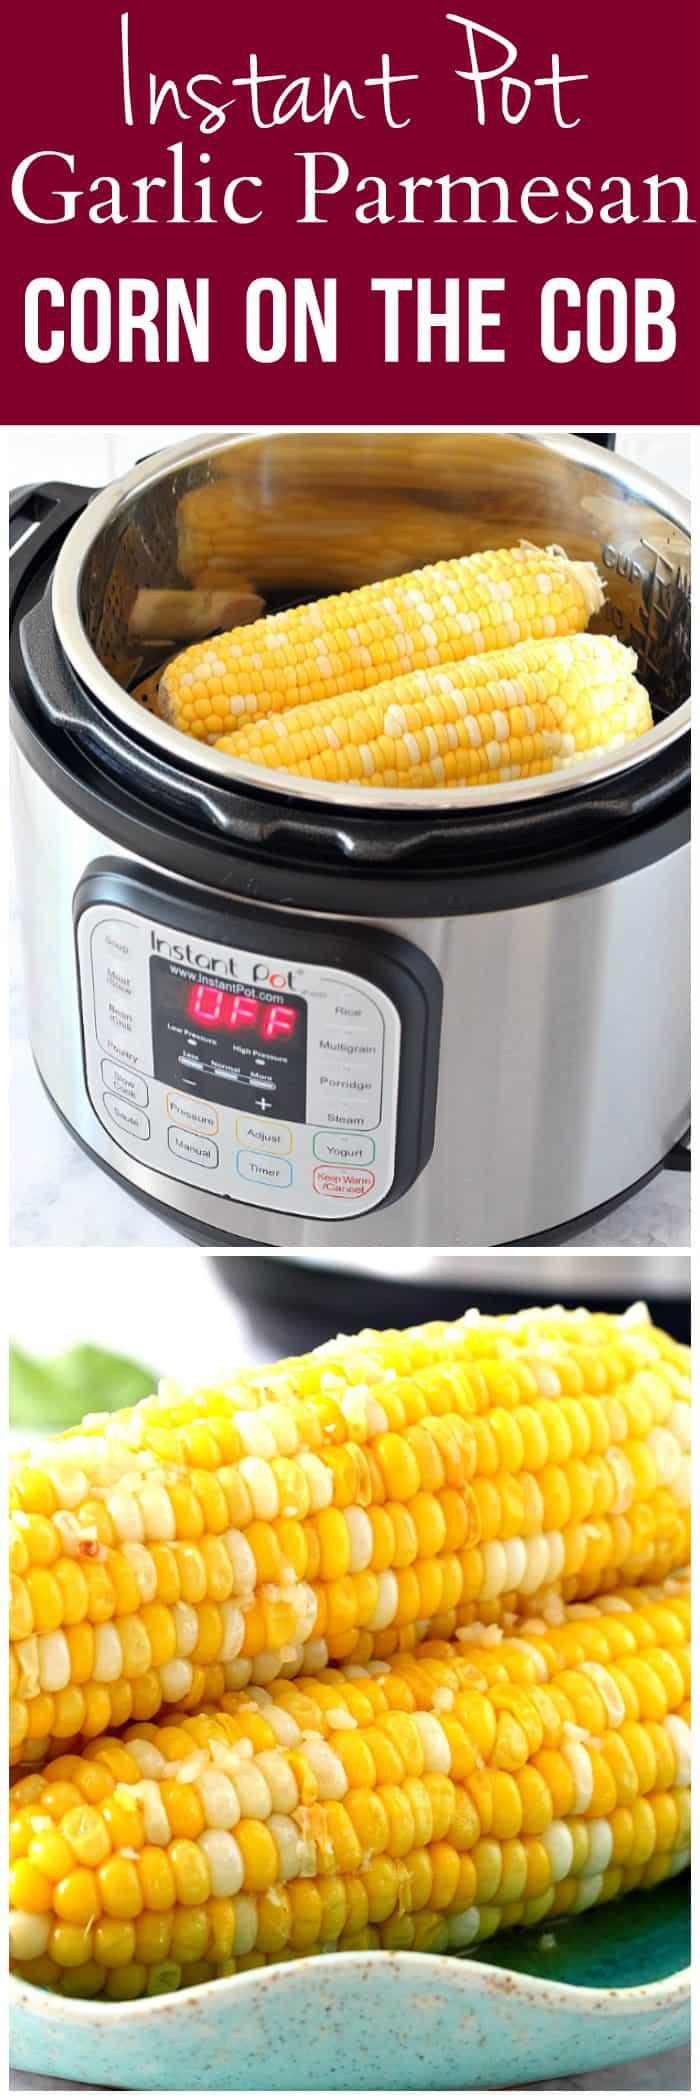 instant pot corn on the cob recipe long1 Instant Pot Garlic Parmesan Corn on the Cob Recipe